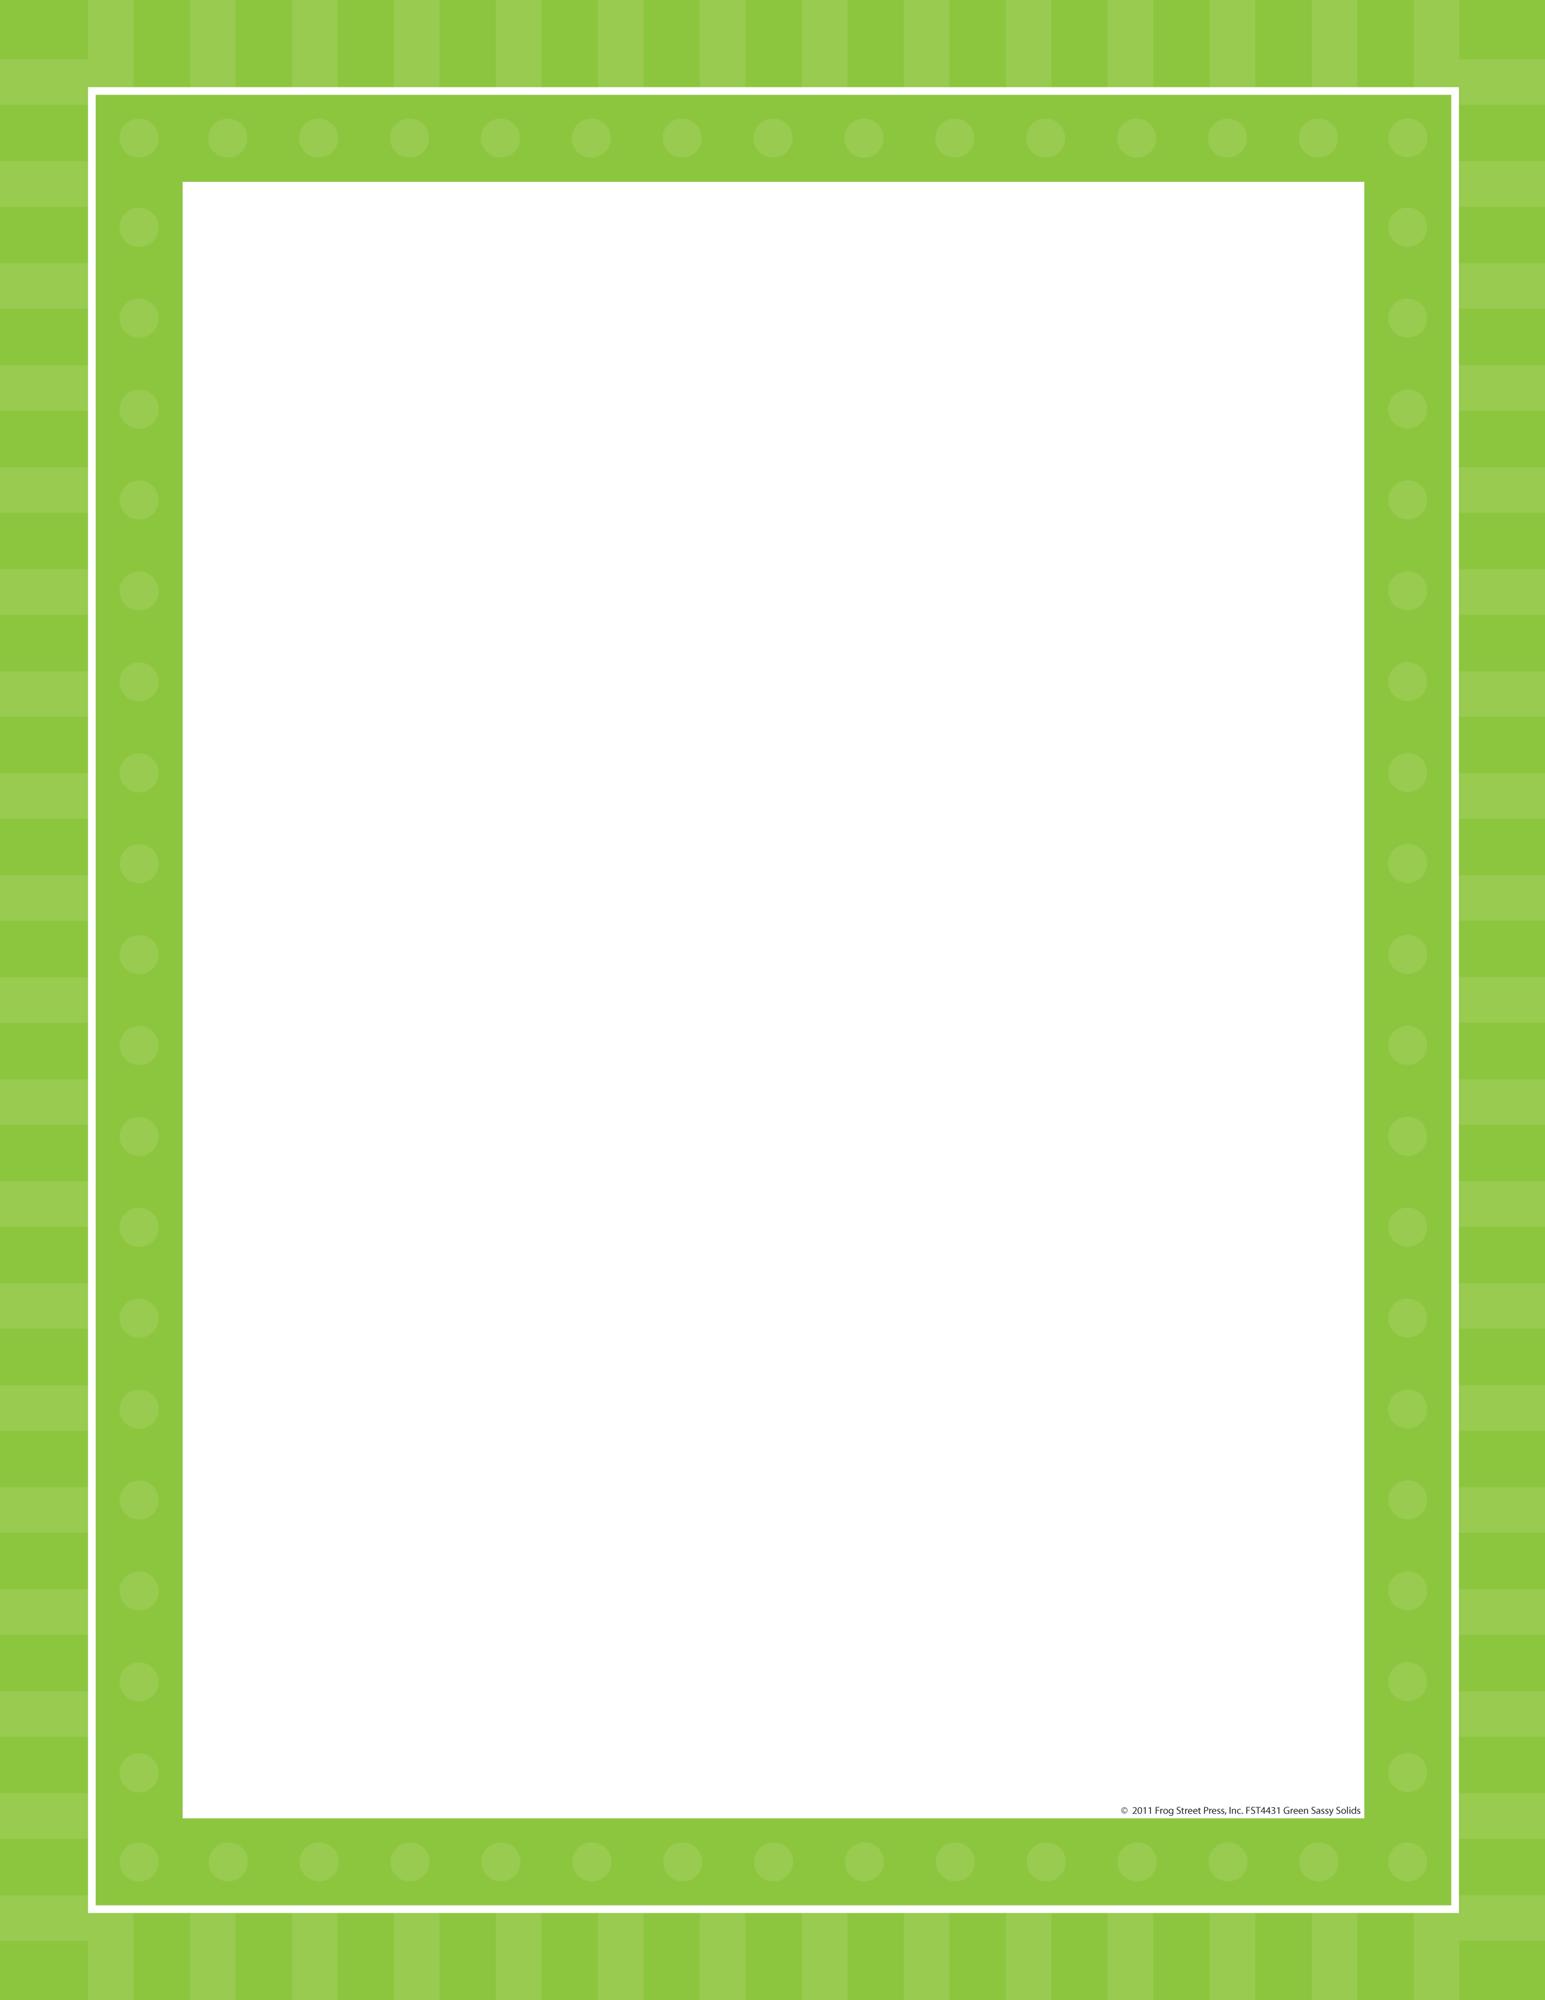 Green computing essay